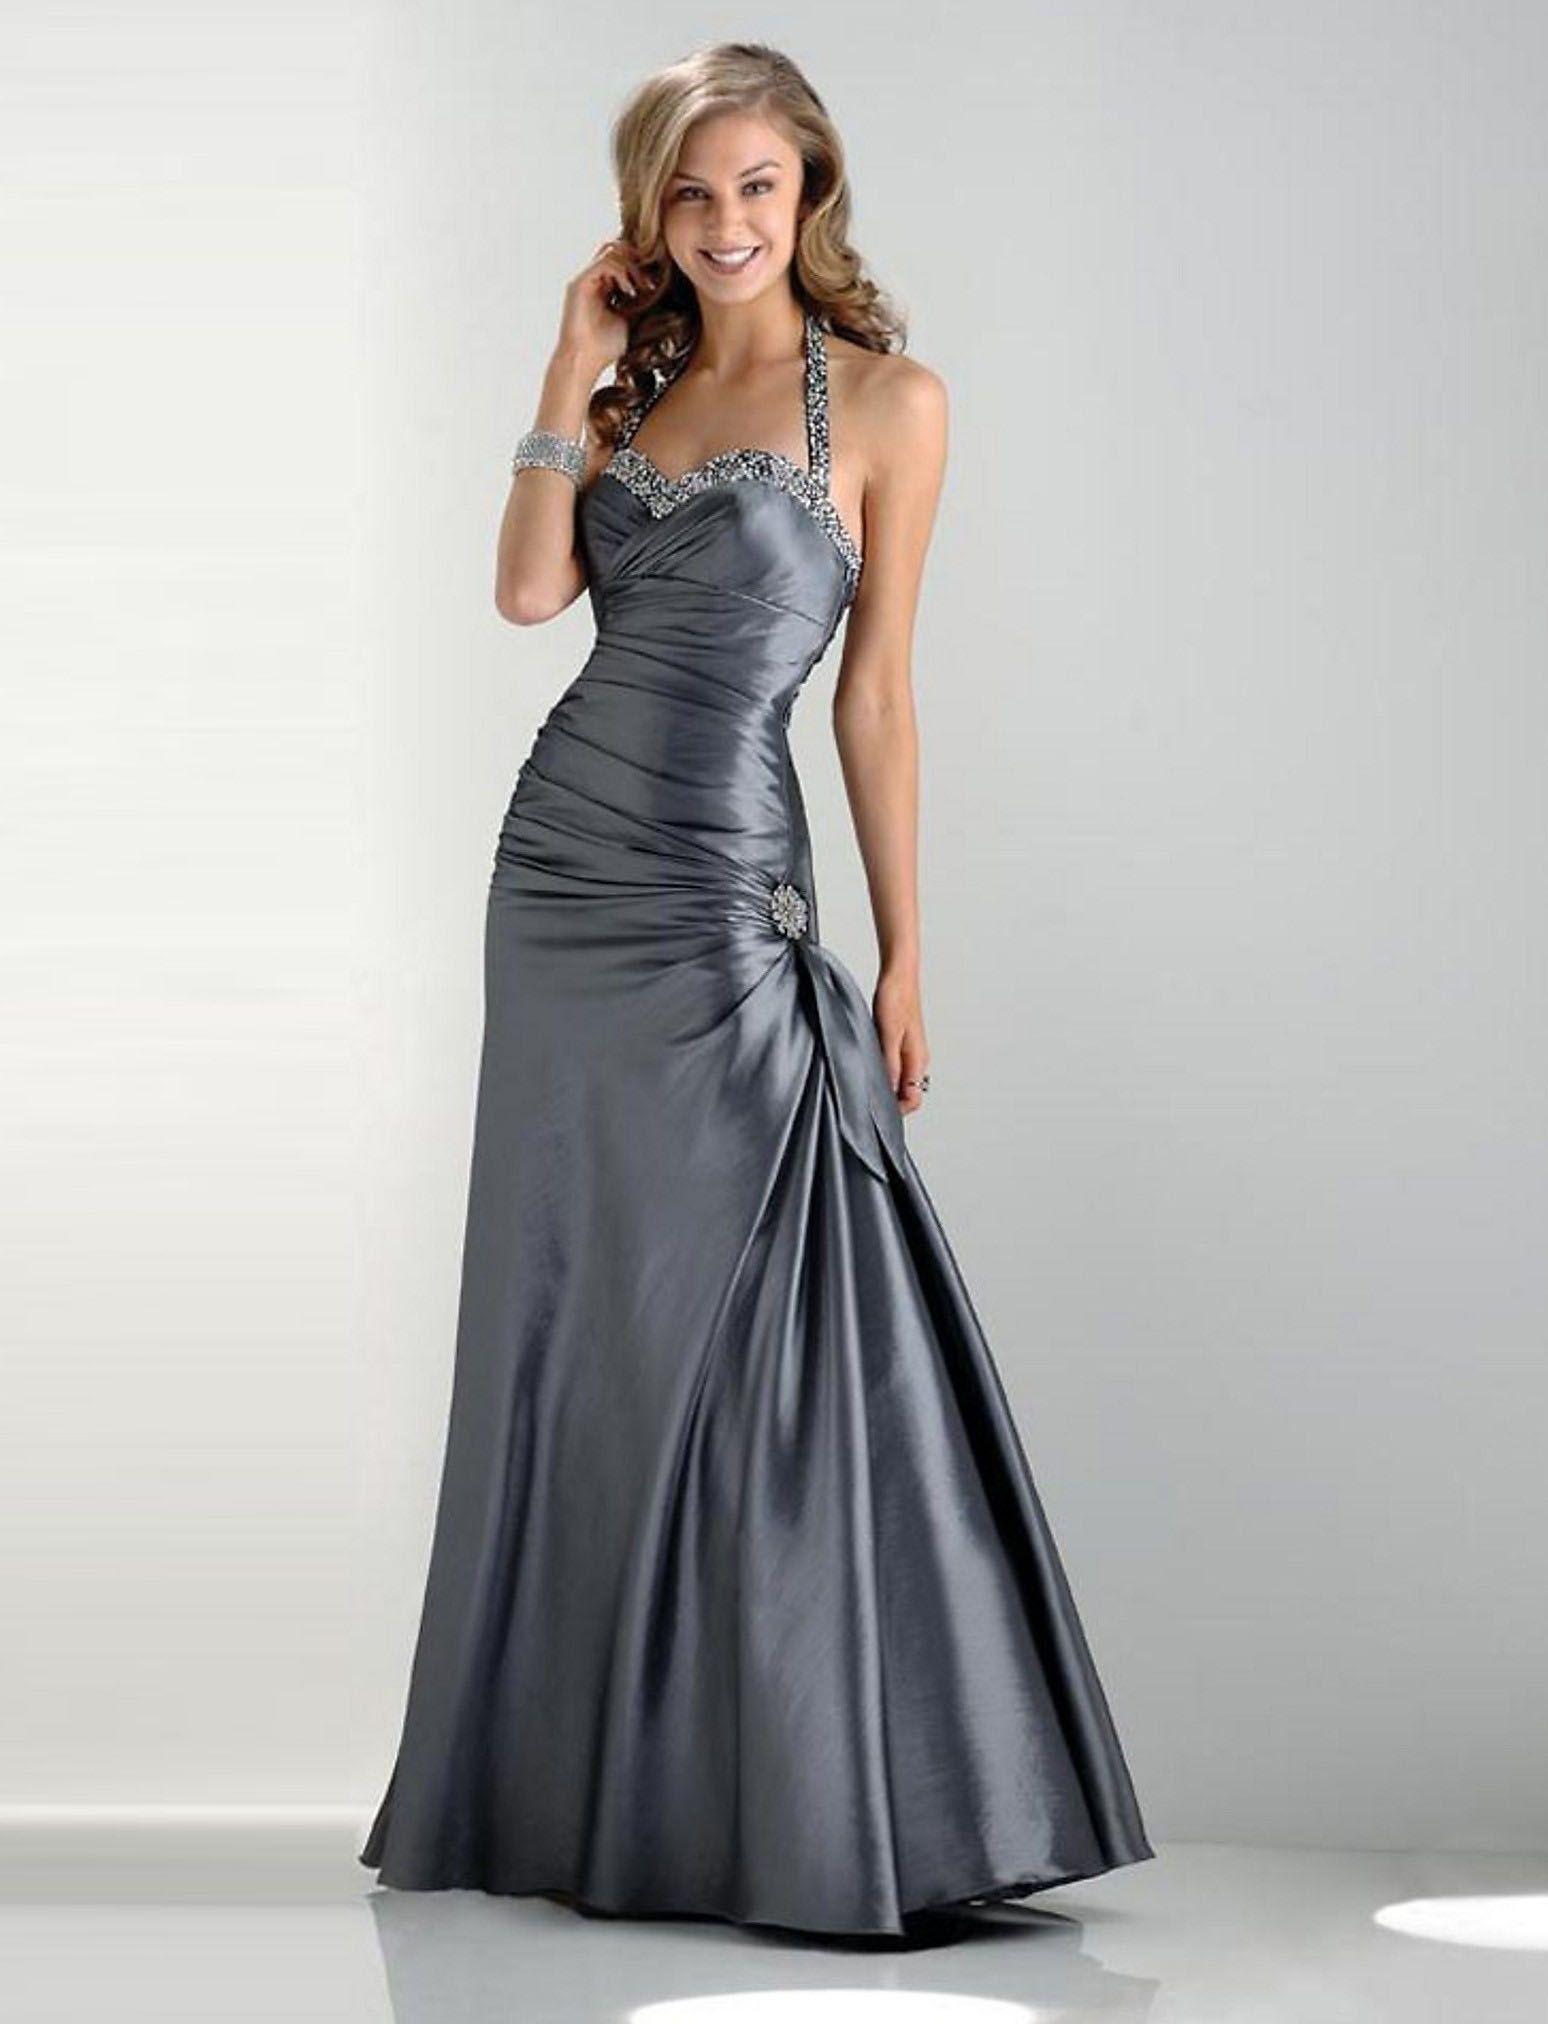 Grey HalterTop Prom Dress SuperCute Clothes Pinterest Prom